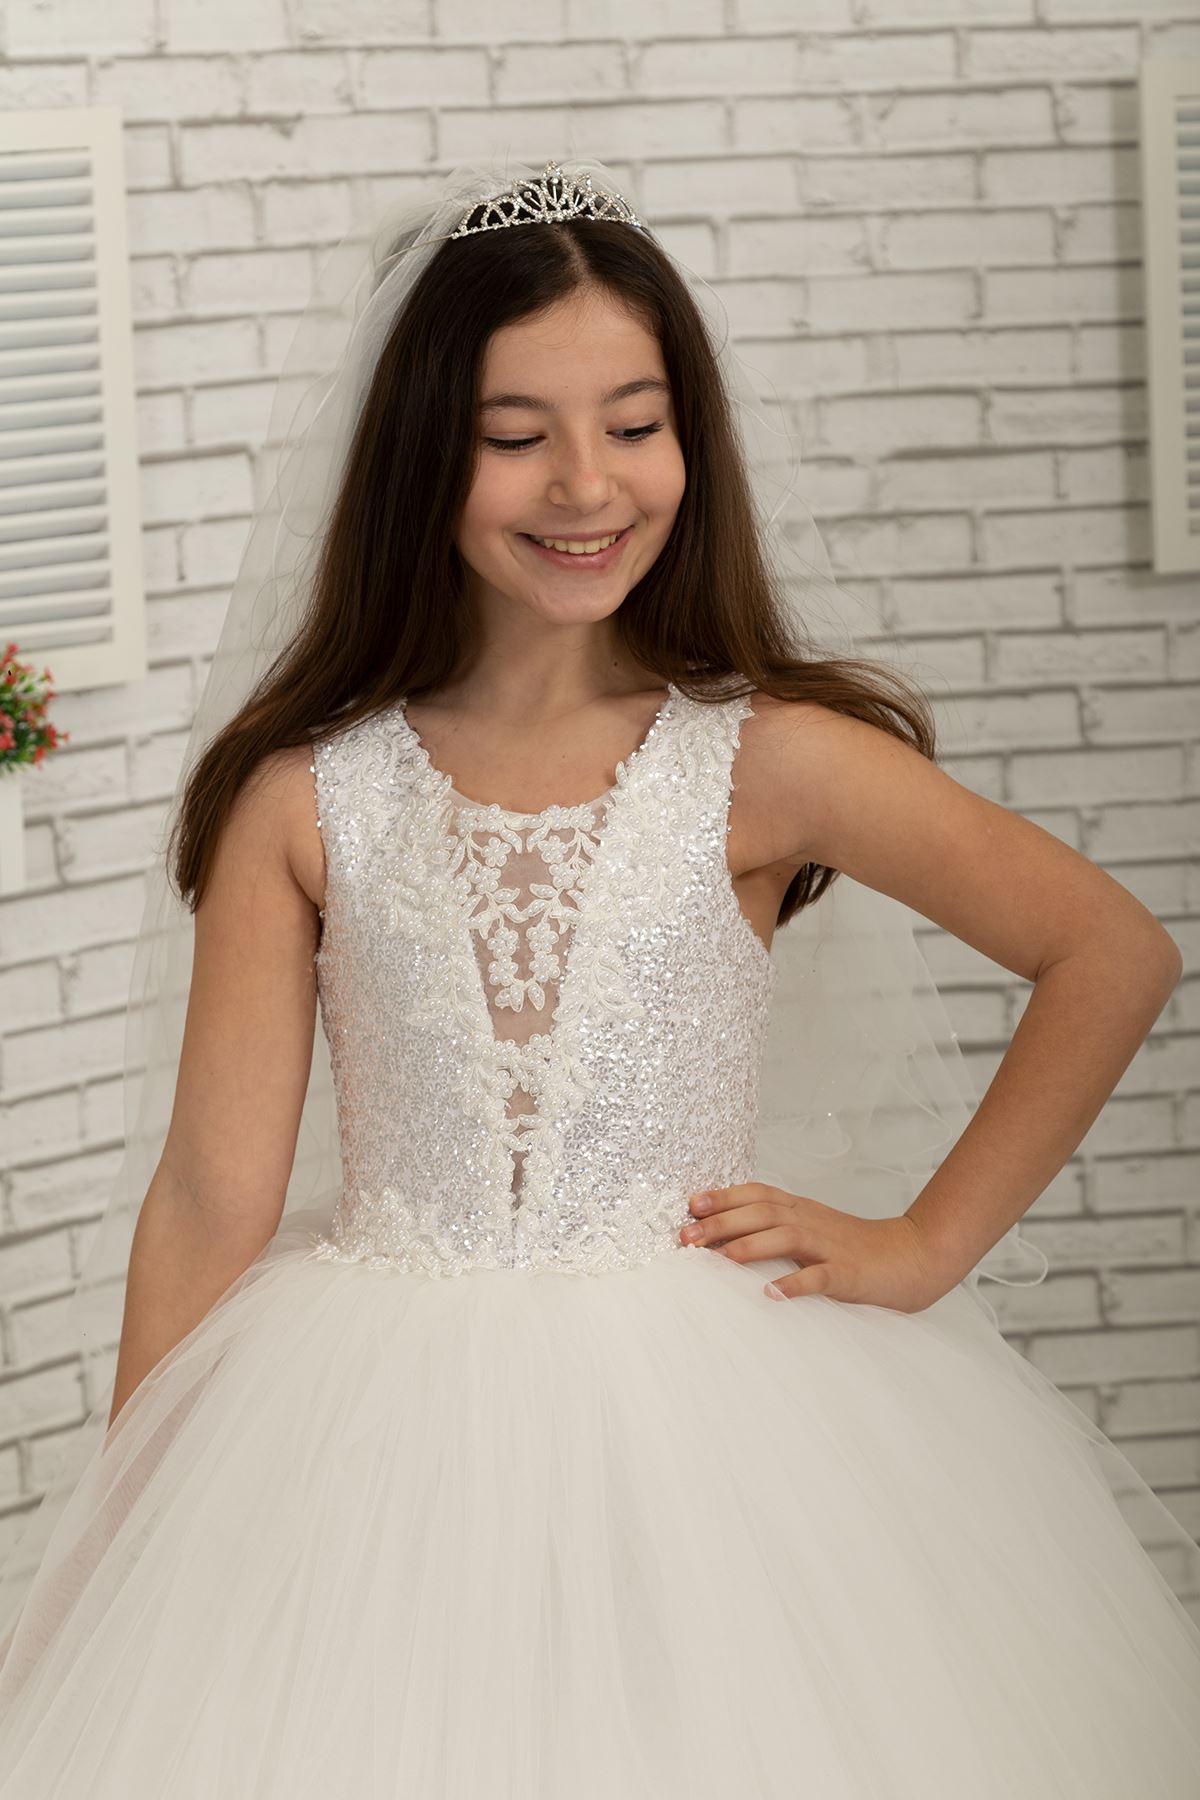 Special sequin body detail, hemline detail Fluffy Girl Child Evening Dress 618 Cream